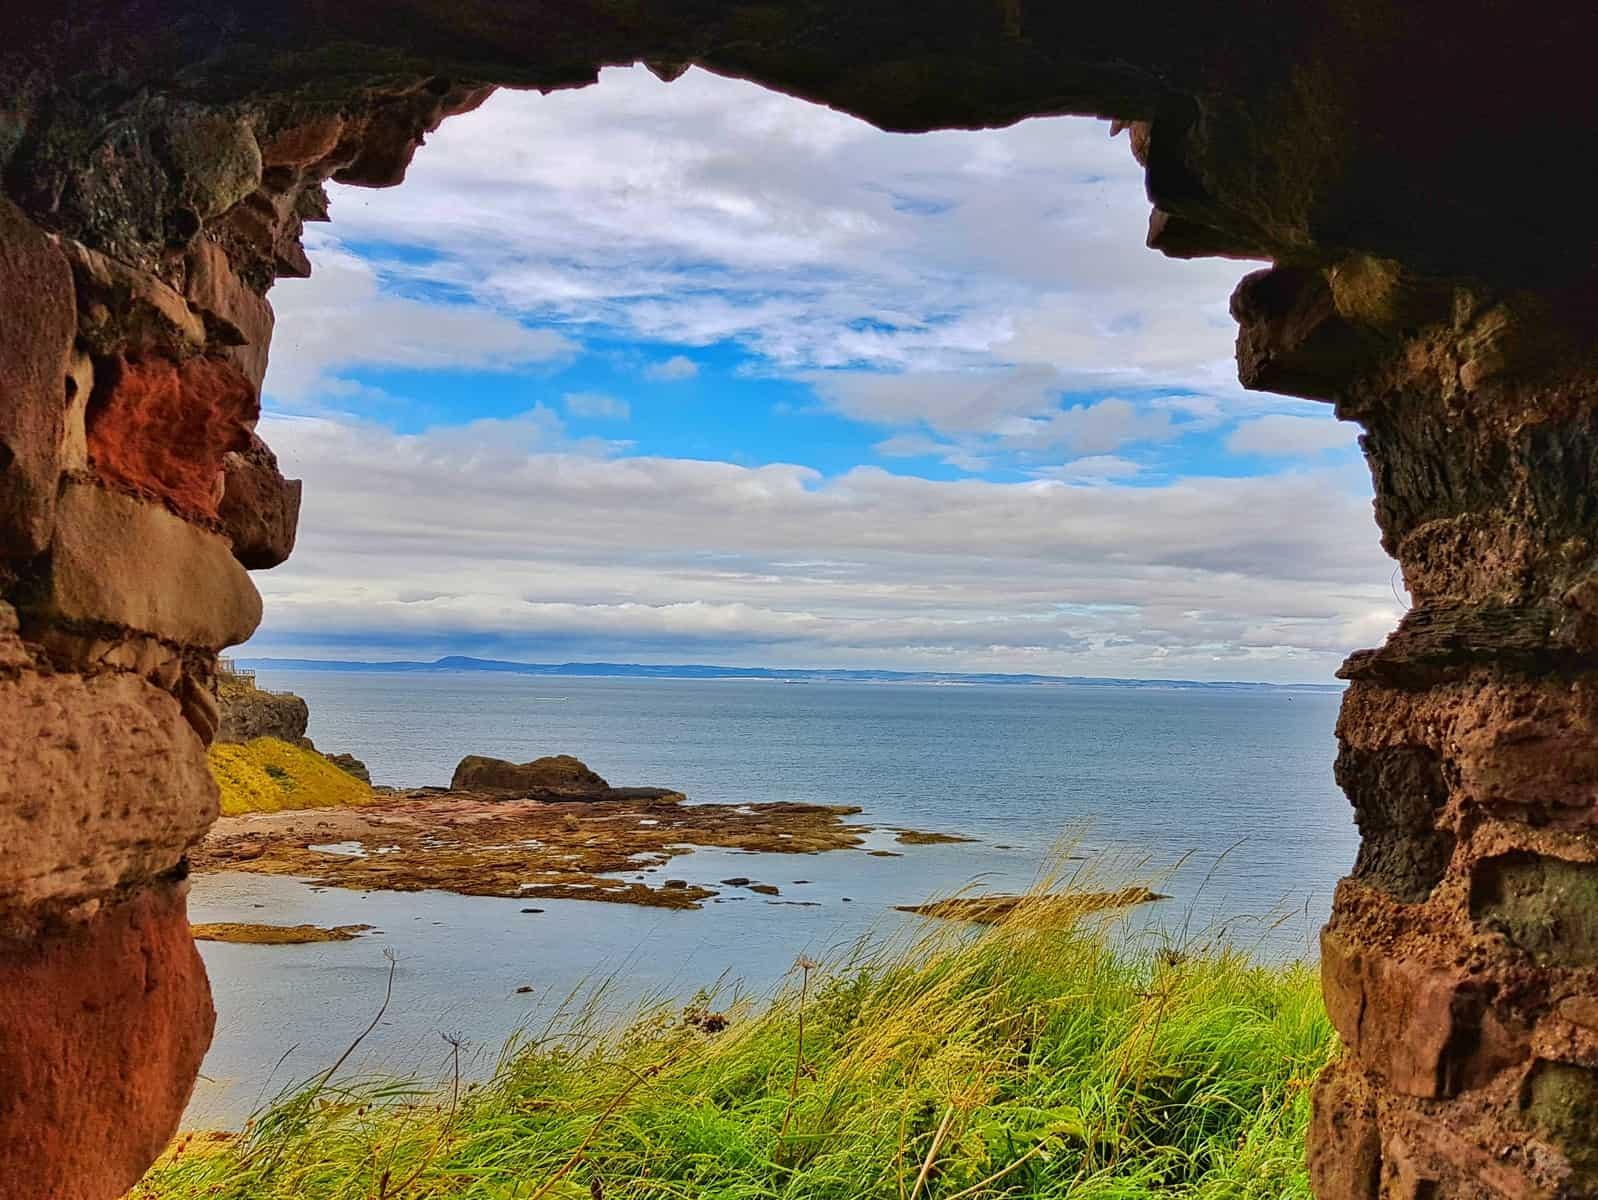 Tantallon Castle and Seacliff Beach East Lothian Scotland - view through window of castle